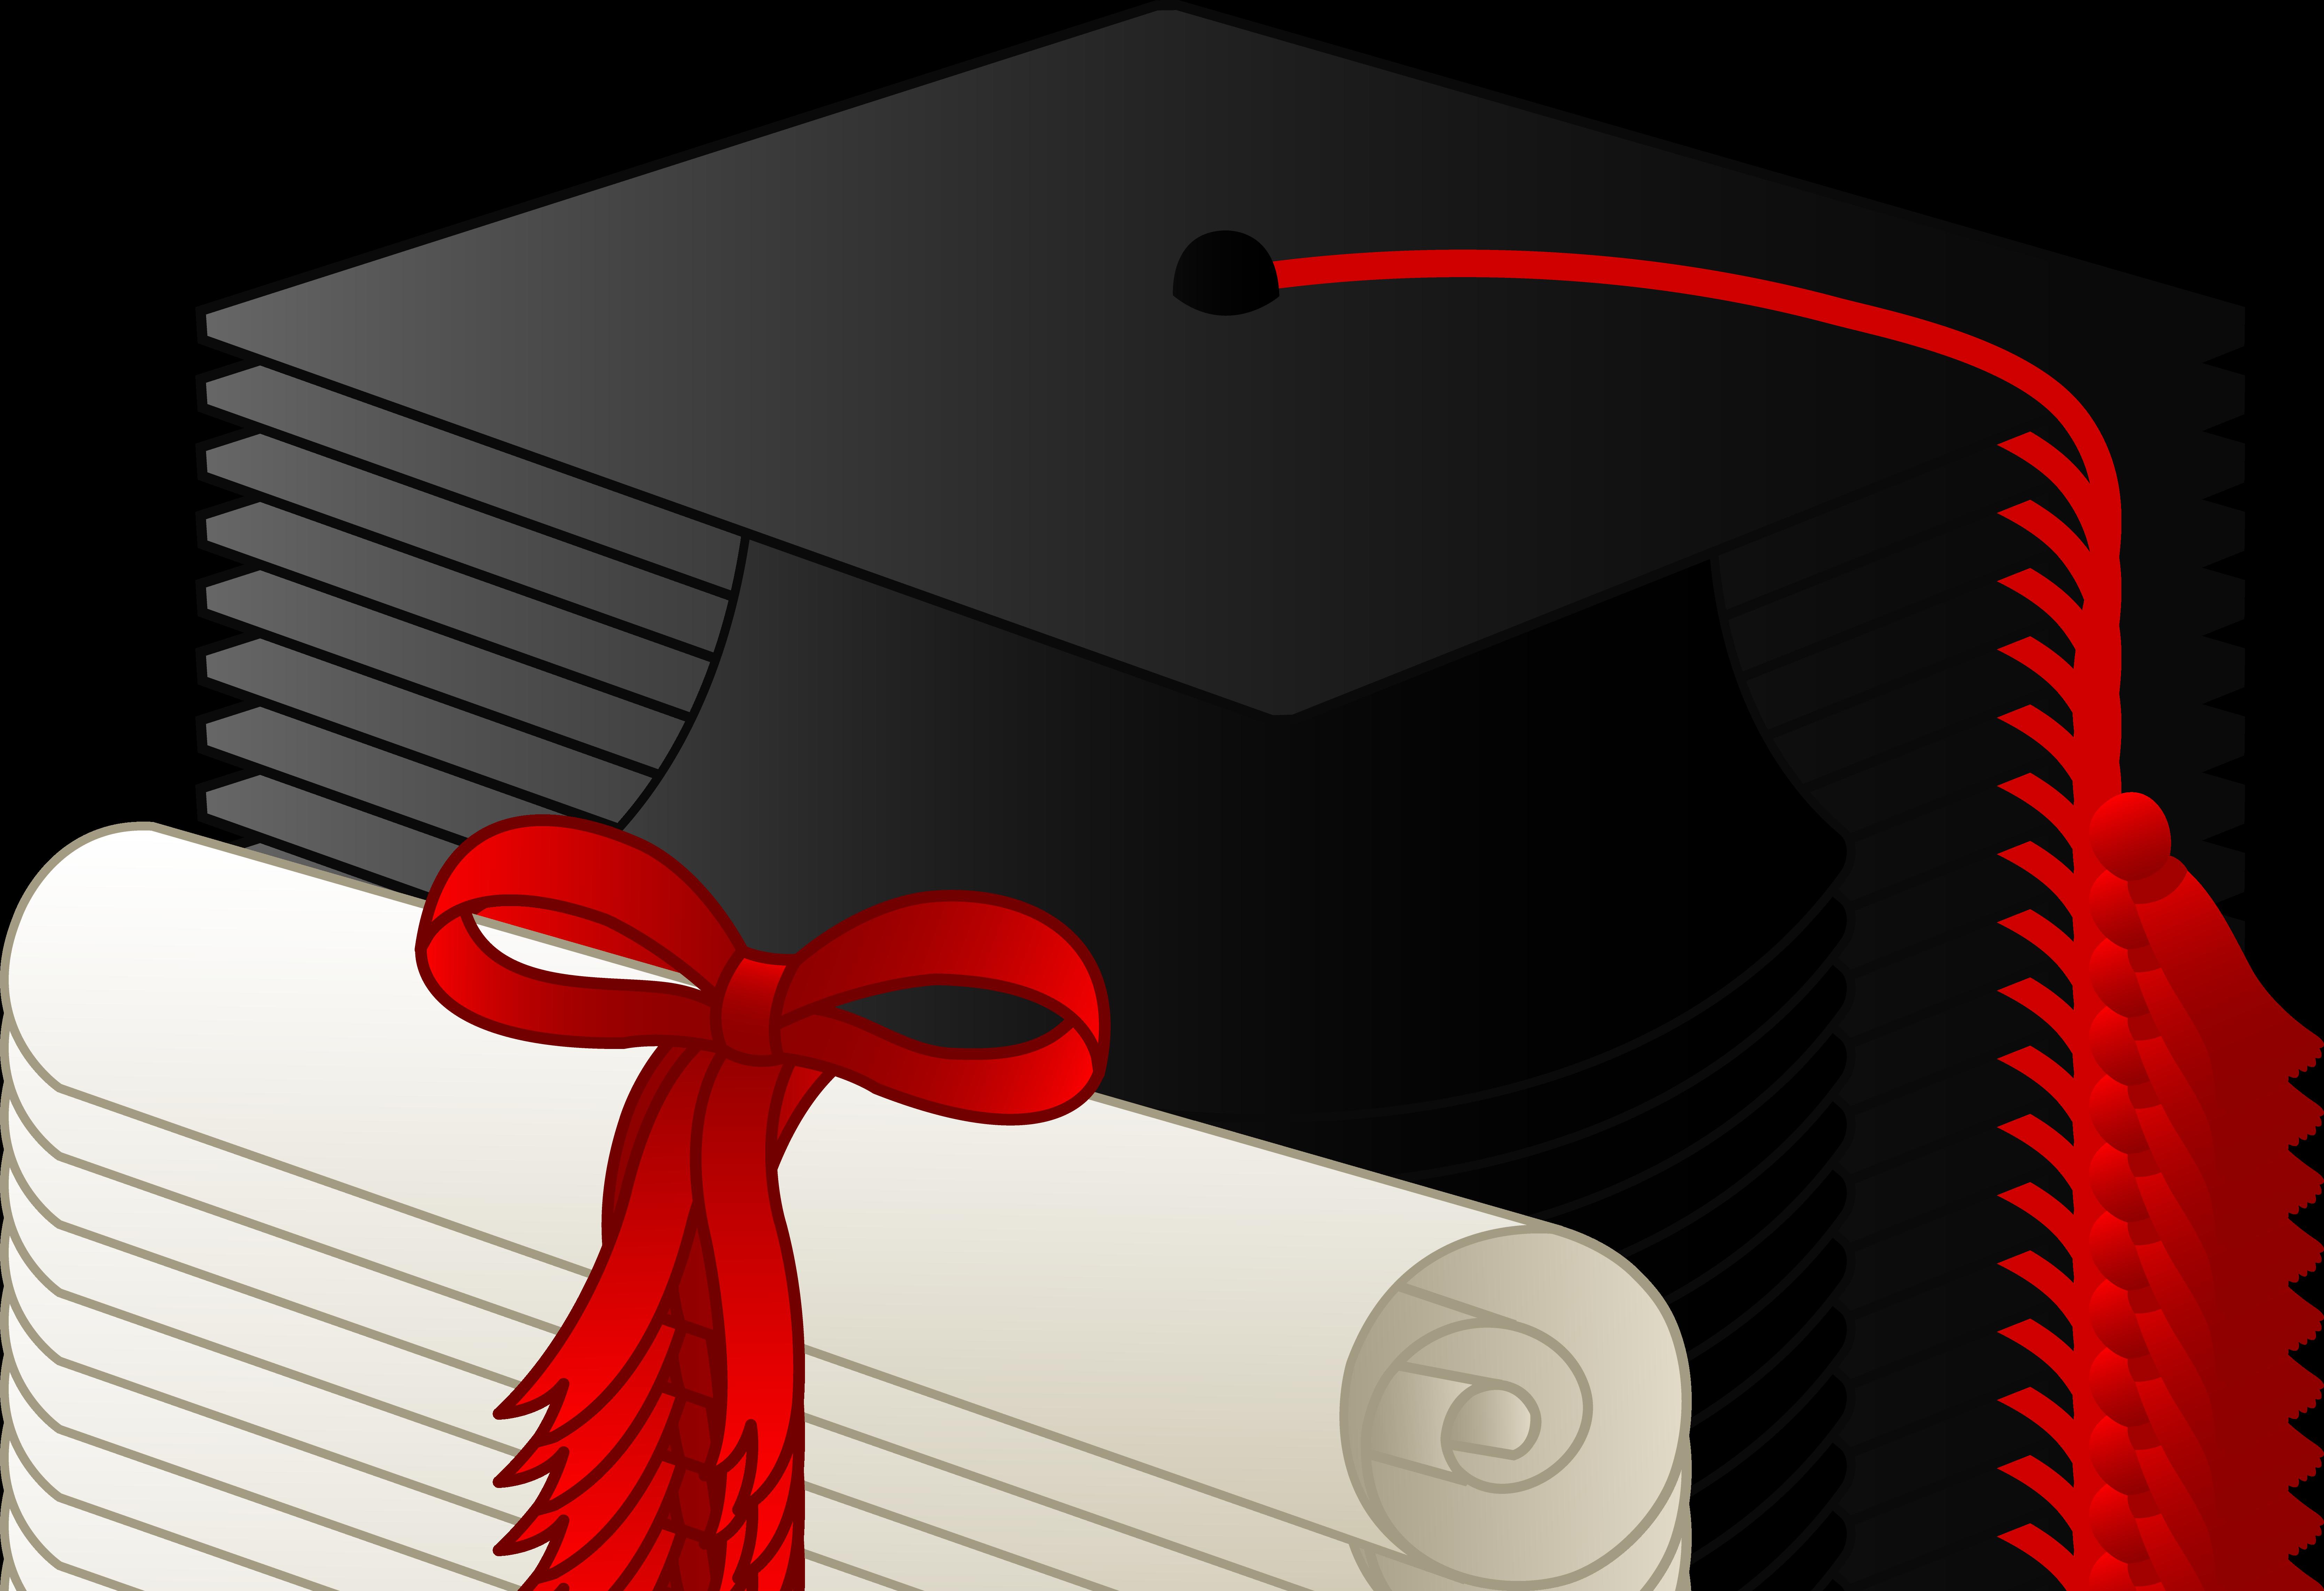 Graduation Cap And Diploma Free Clip Art Graduation Cap Clipart Graduation Clip Art Graduation Diploma